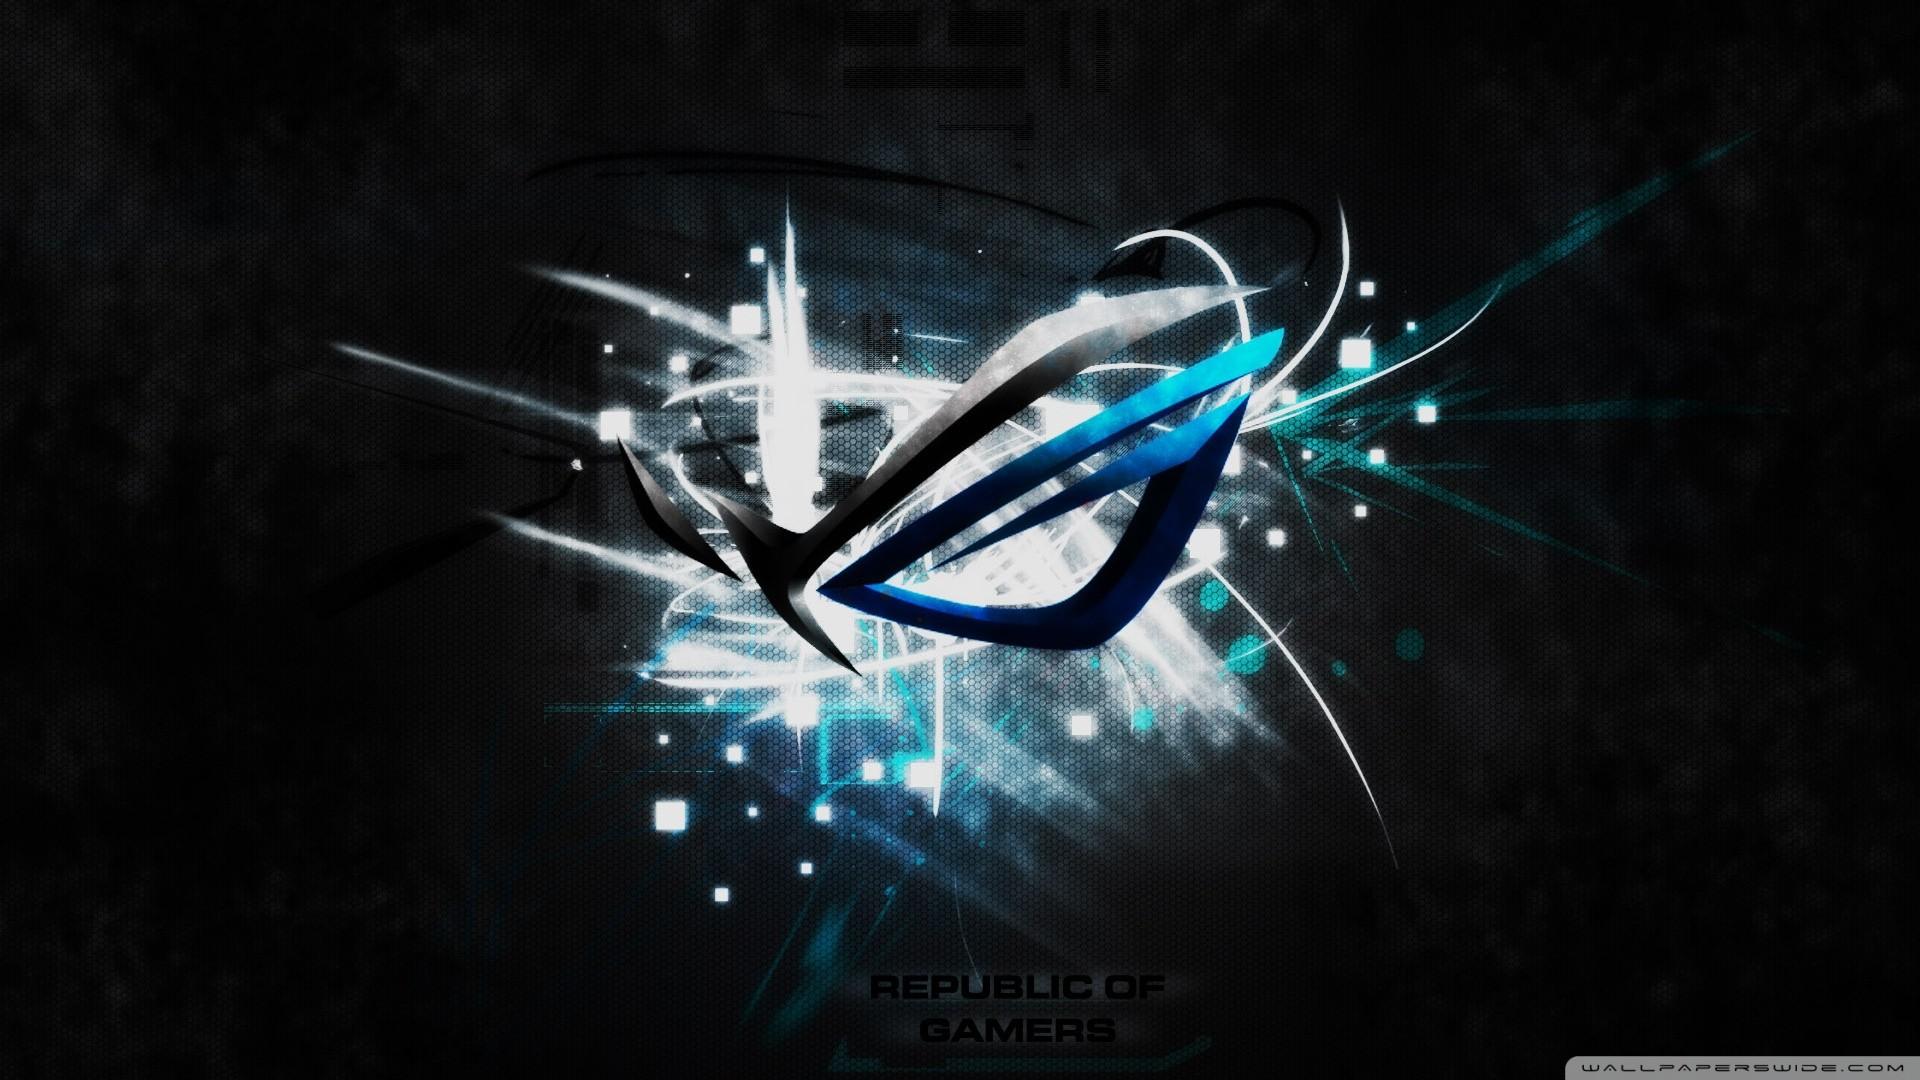 … asus republic of gamers hd desktop wallpaper high definition …